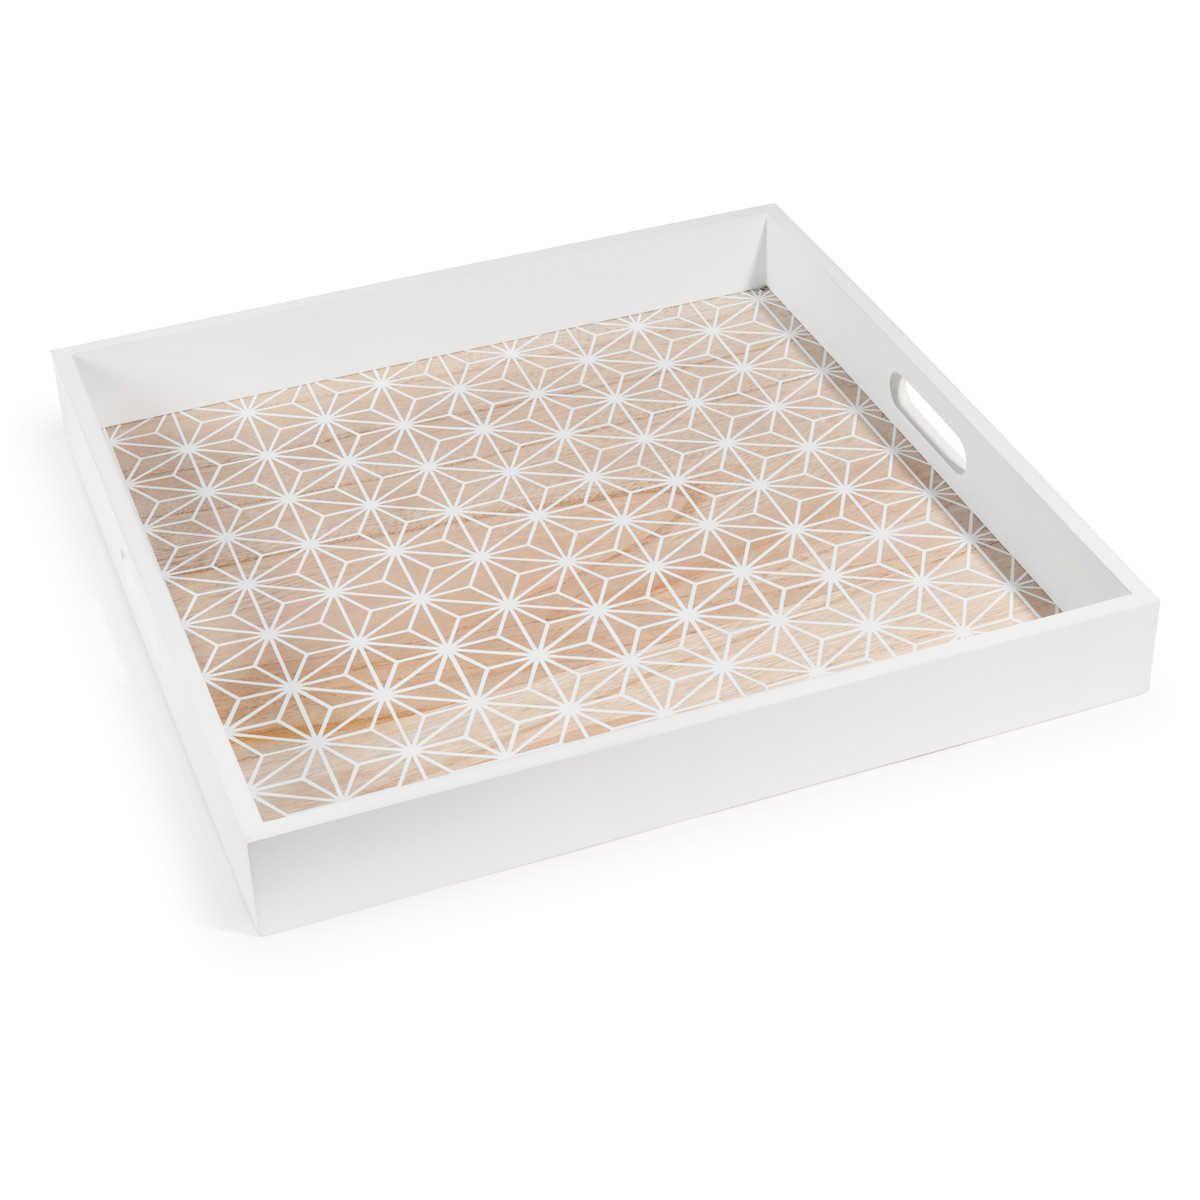 menaje de mesa en 2019 house home decoration white wooden tray white tray et tray. Black Bedroom Furniture Sets. Home Design Ideas